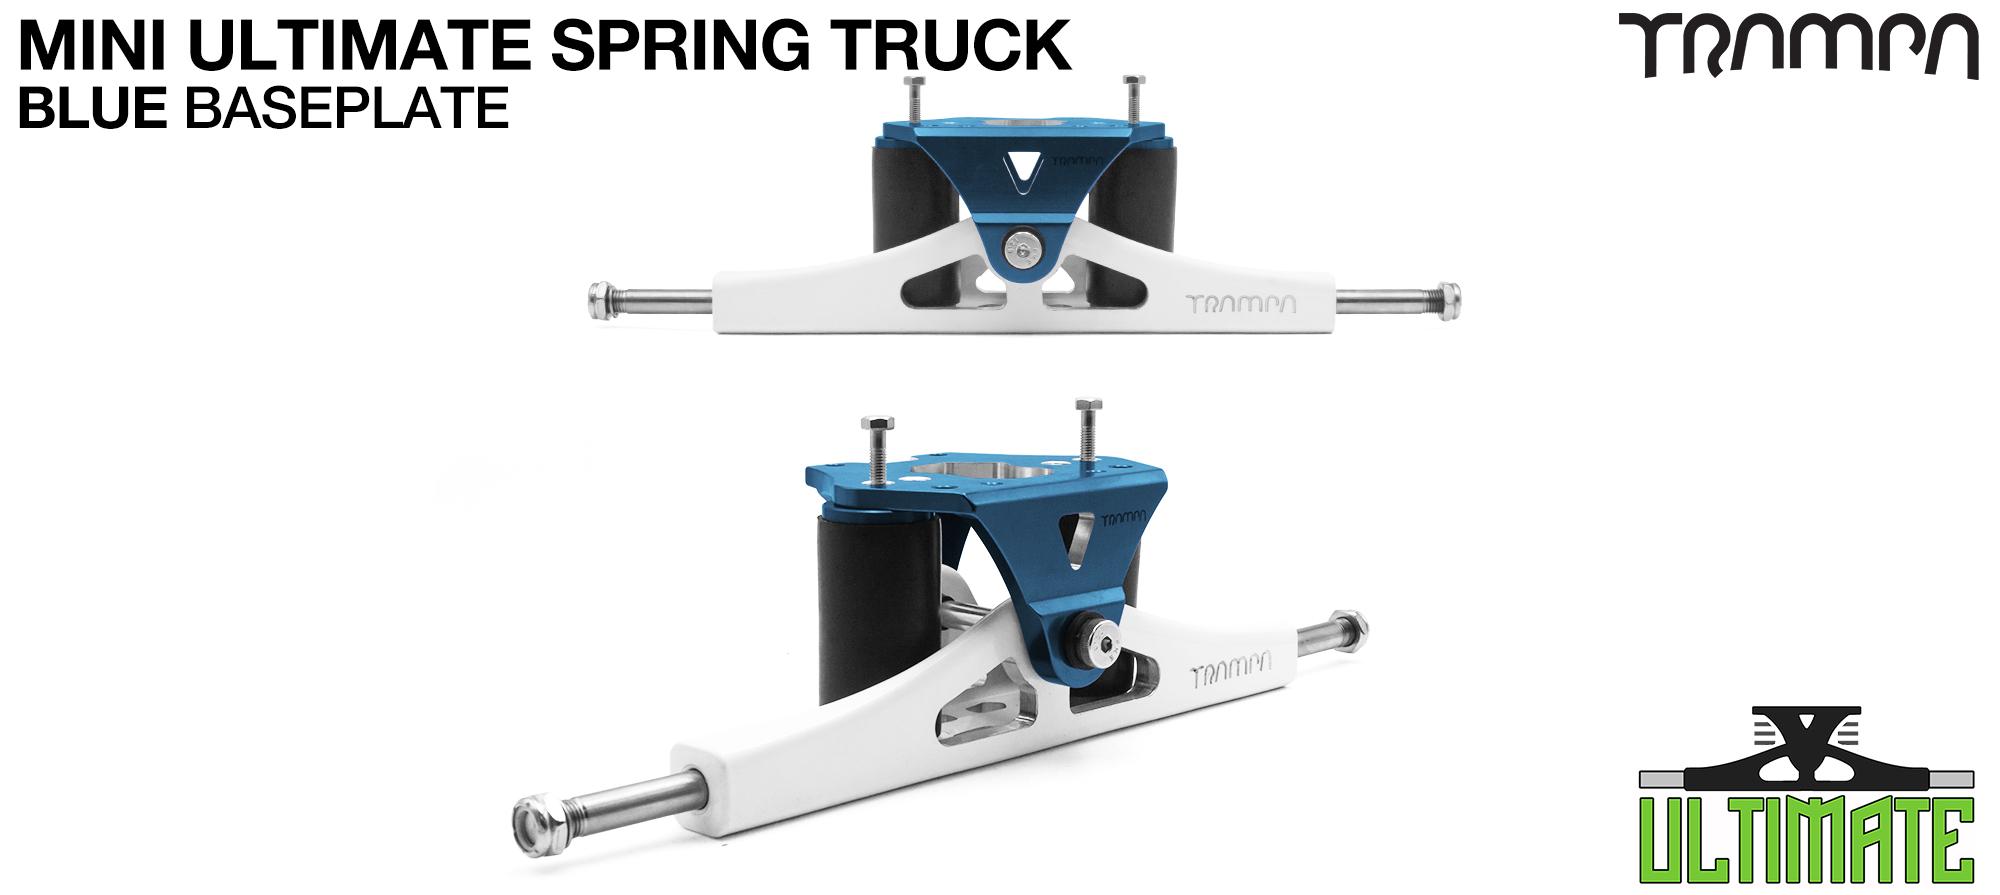 Mini ULTIMATE TRAMPA TRUCKS - CNC FORGED Channel Hanger with 9.525mm TITANIUM Axle CNC Baseplate TITANIUM Kingpin - BLUE